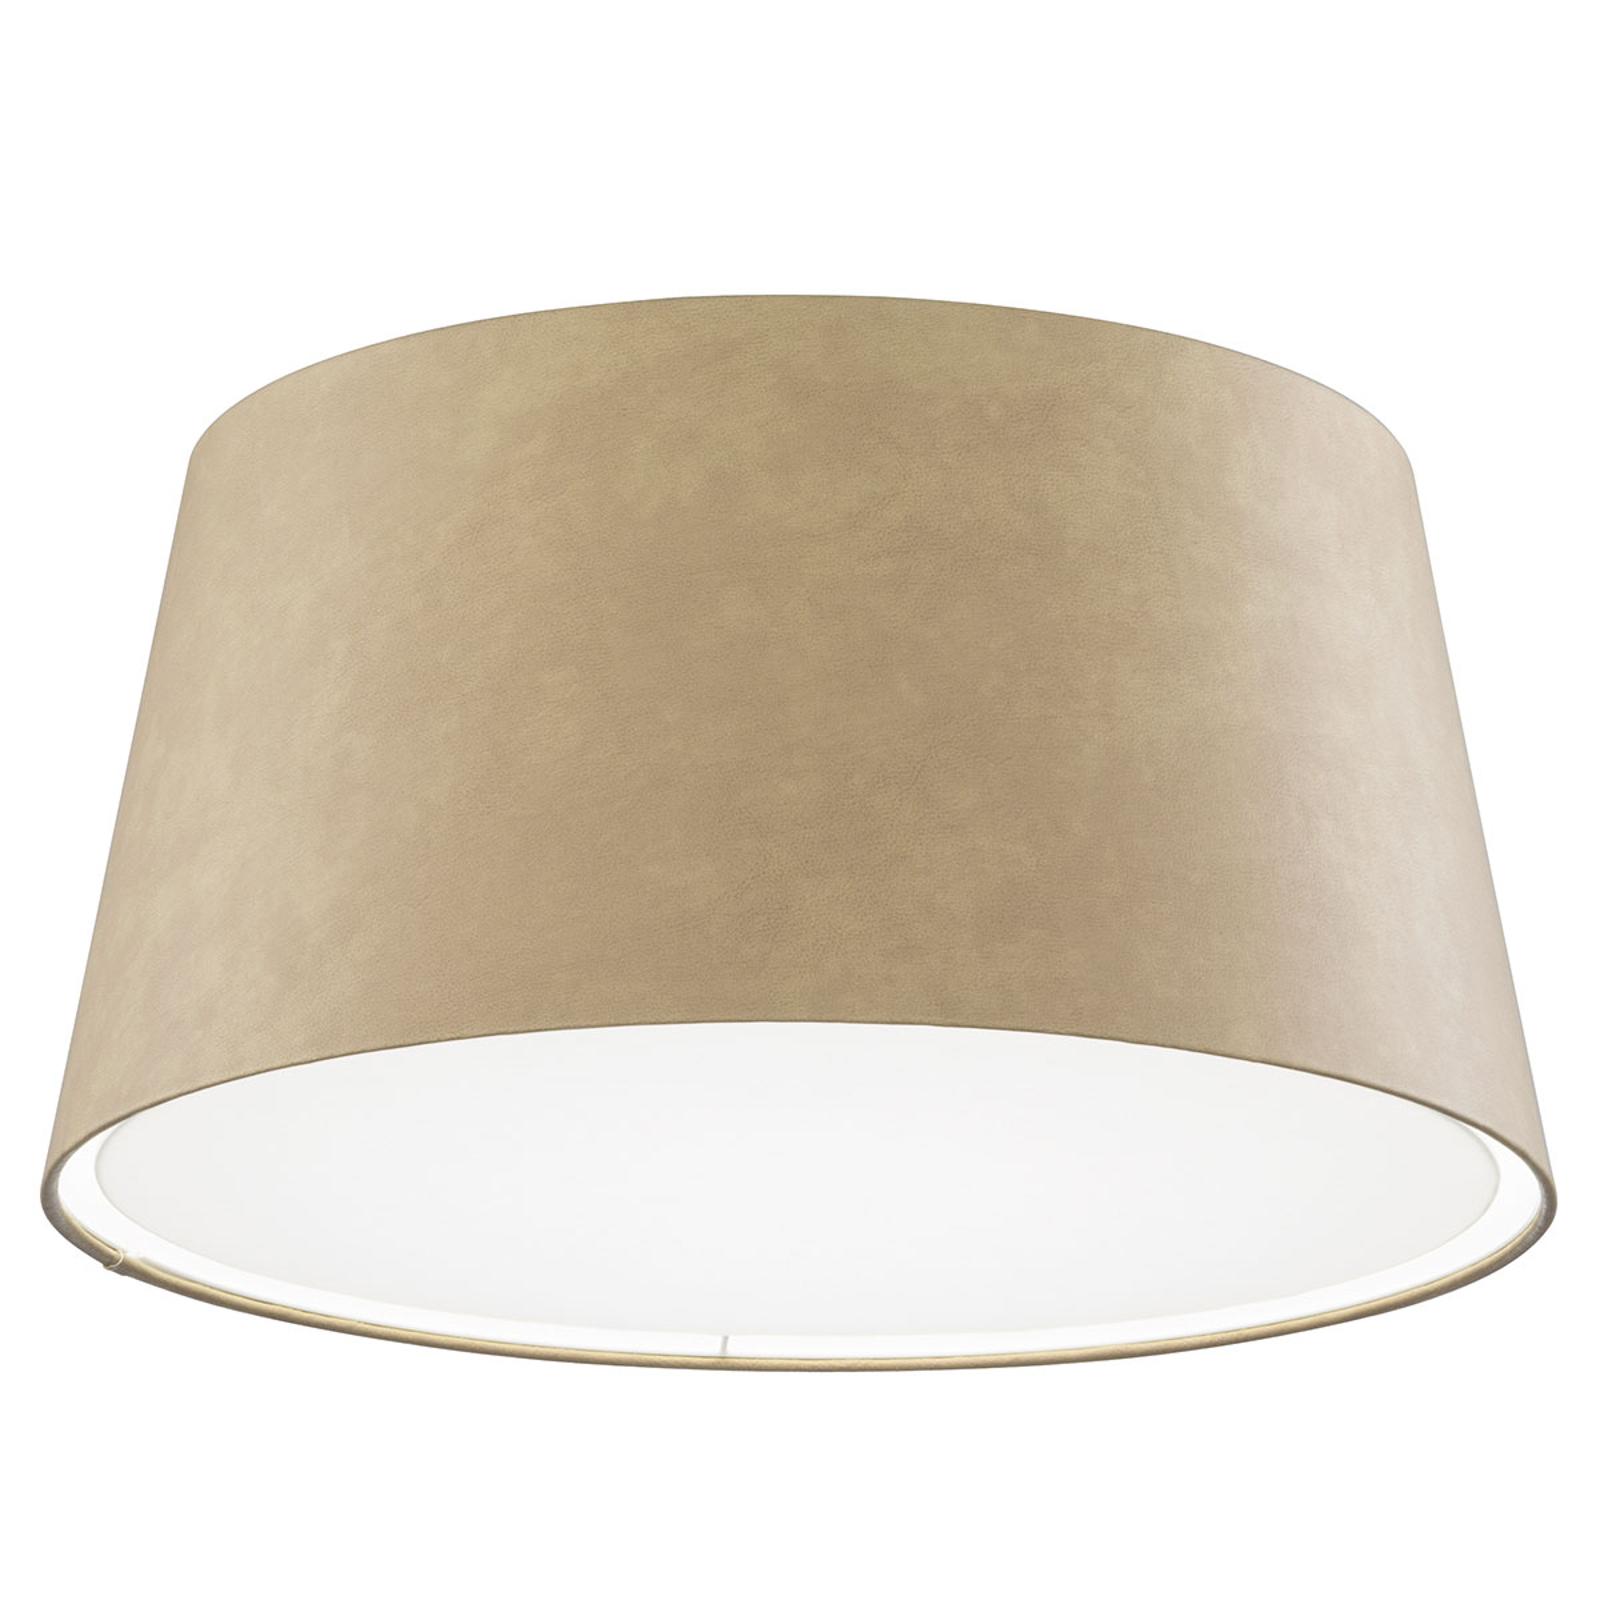 LED plafondlamp Louise dimbaar 3.000 K zand